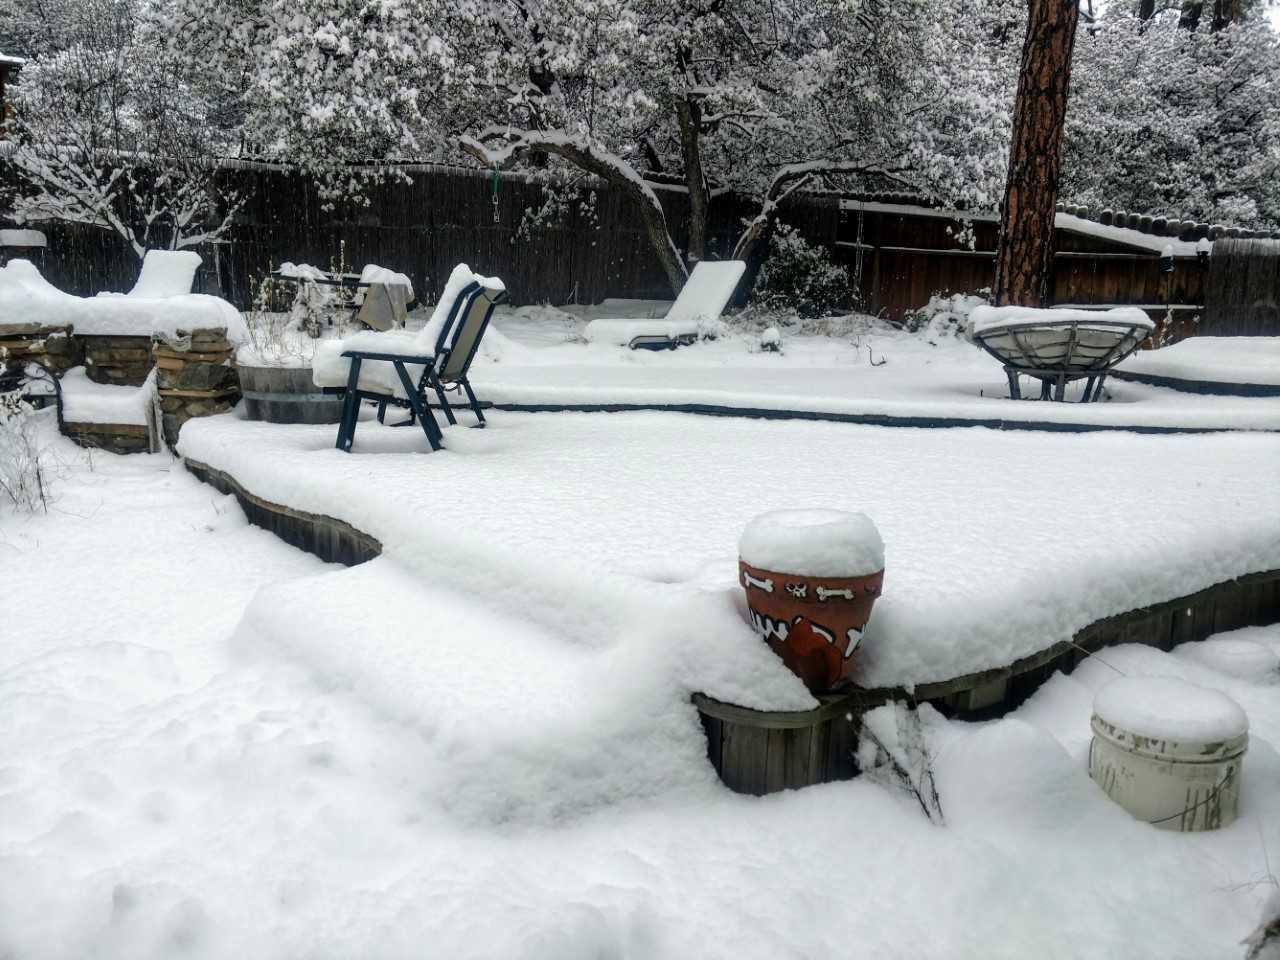 snow in scottsdale az 2020